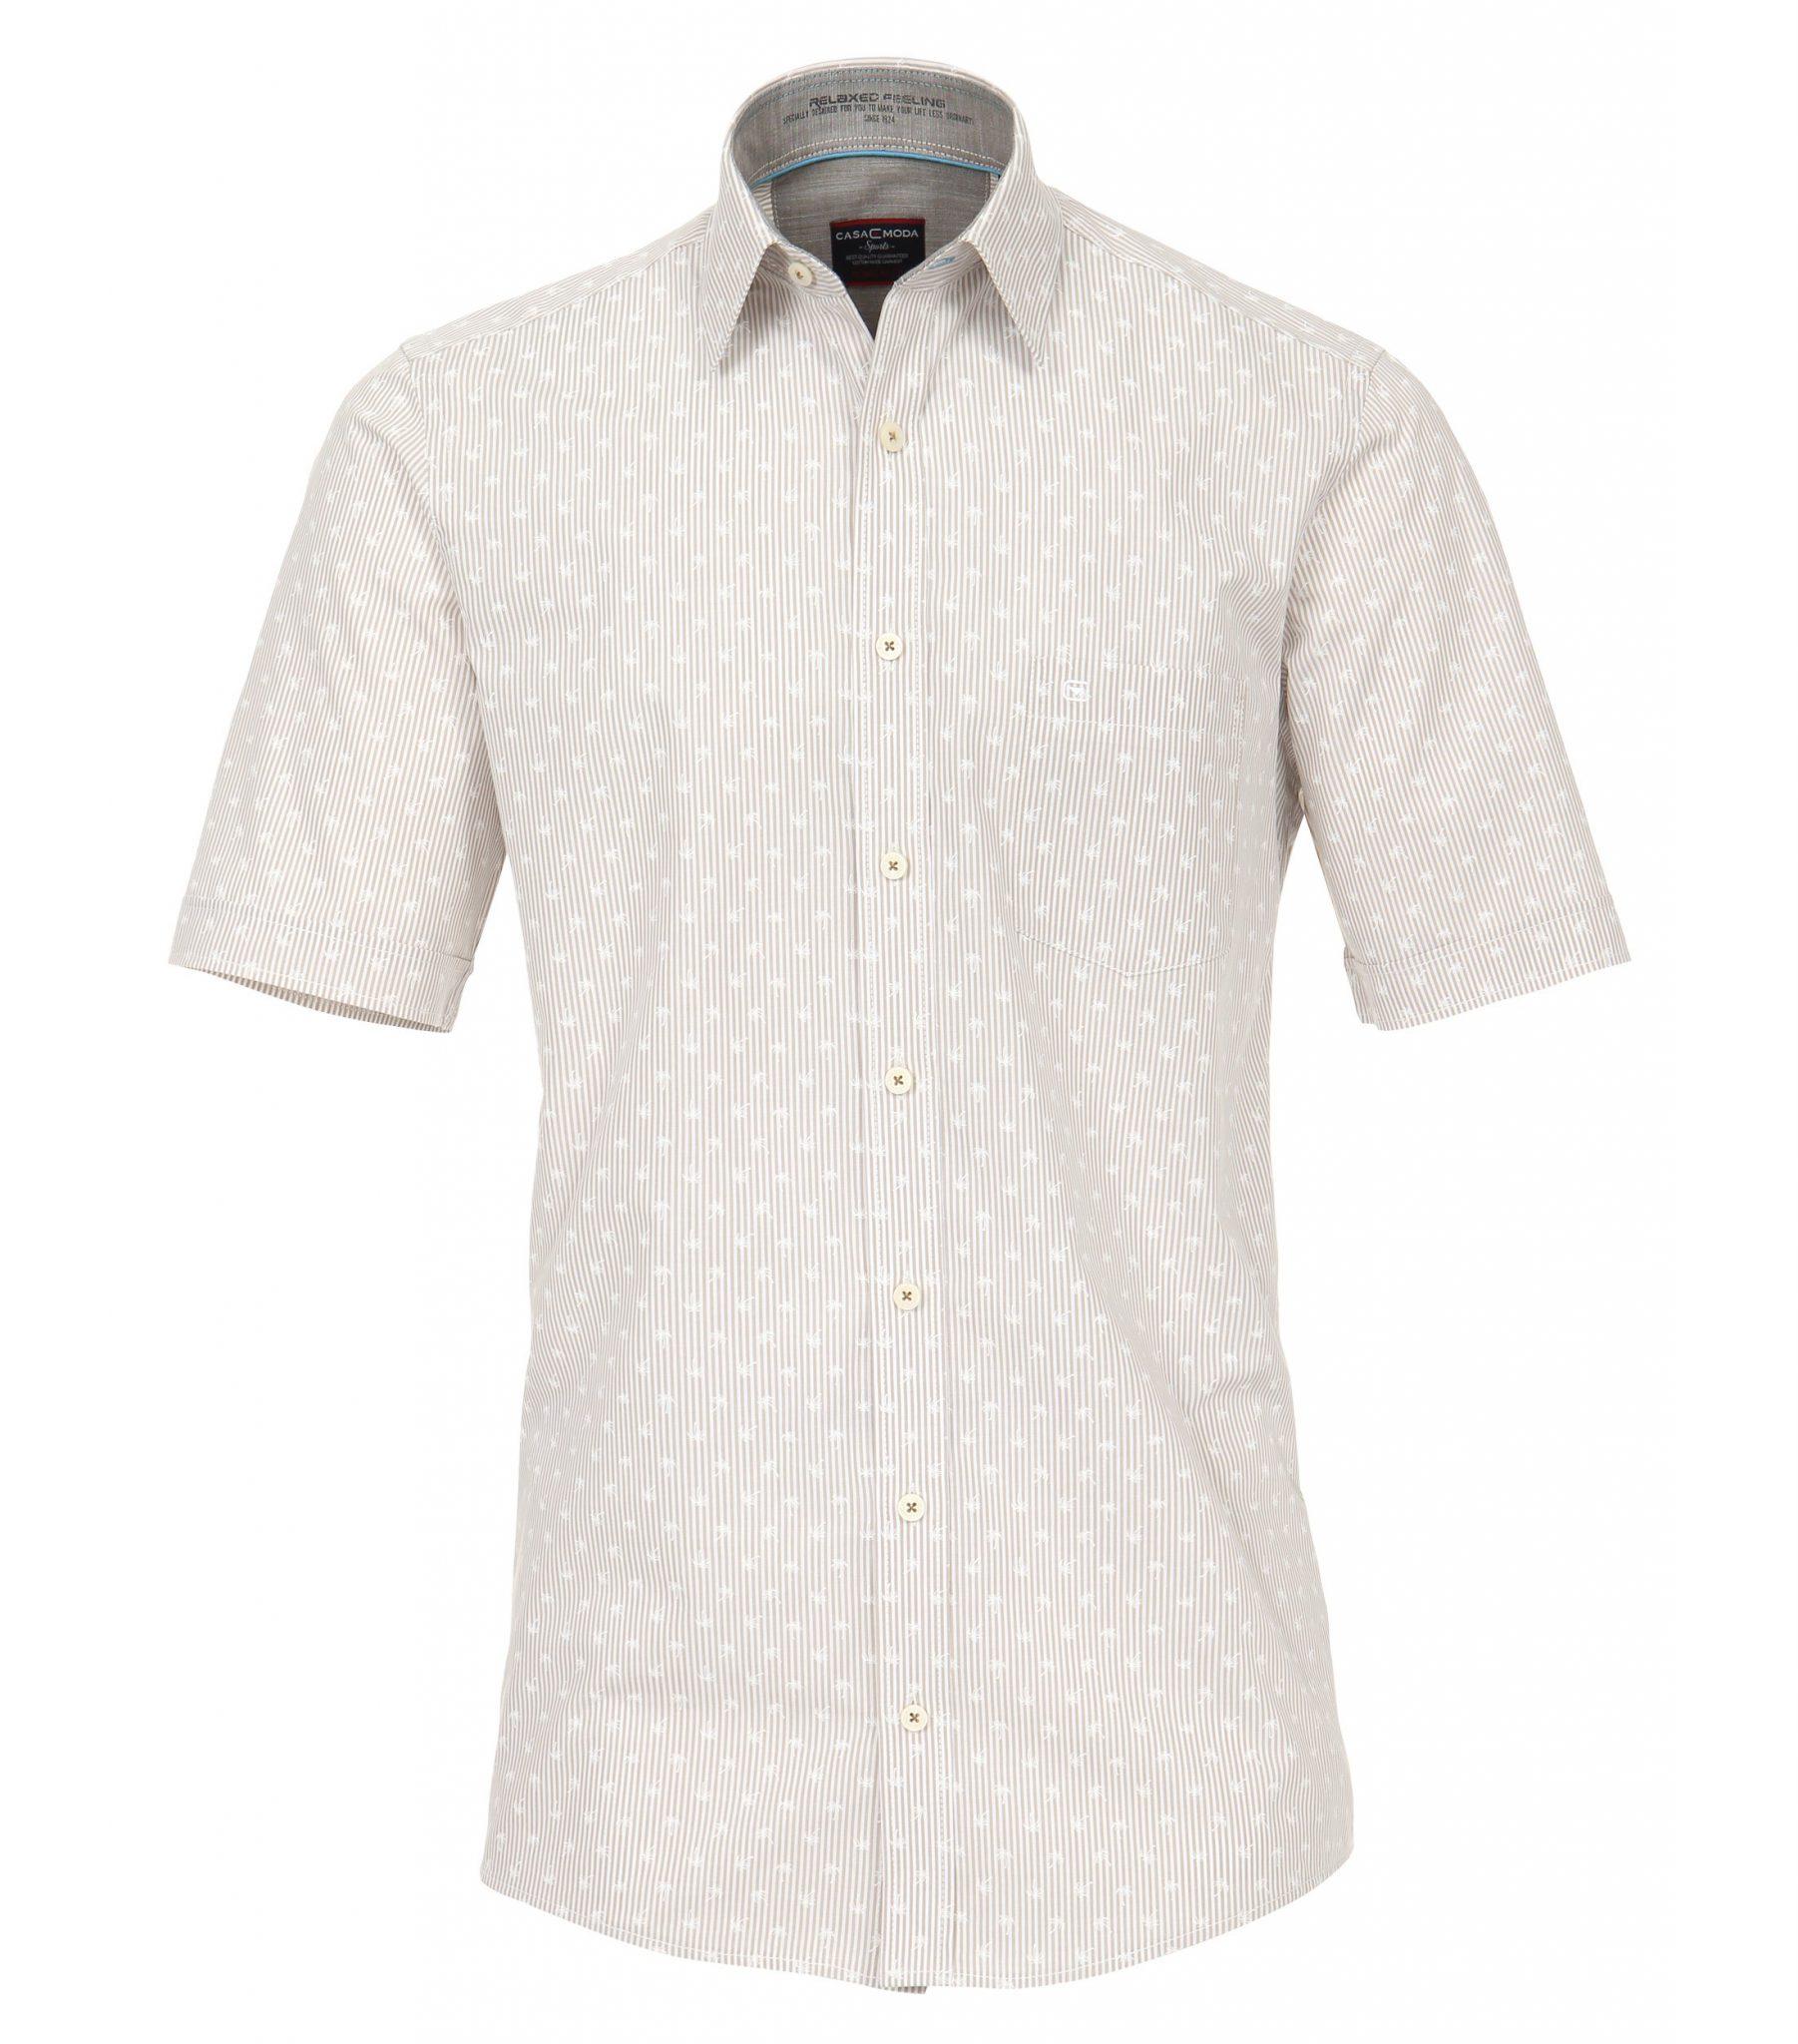 Grote maat Casa Moda overhemd beige en wit fantasie printje